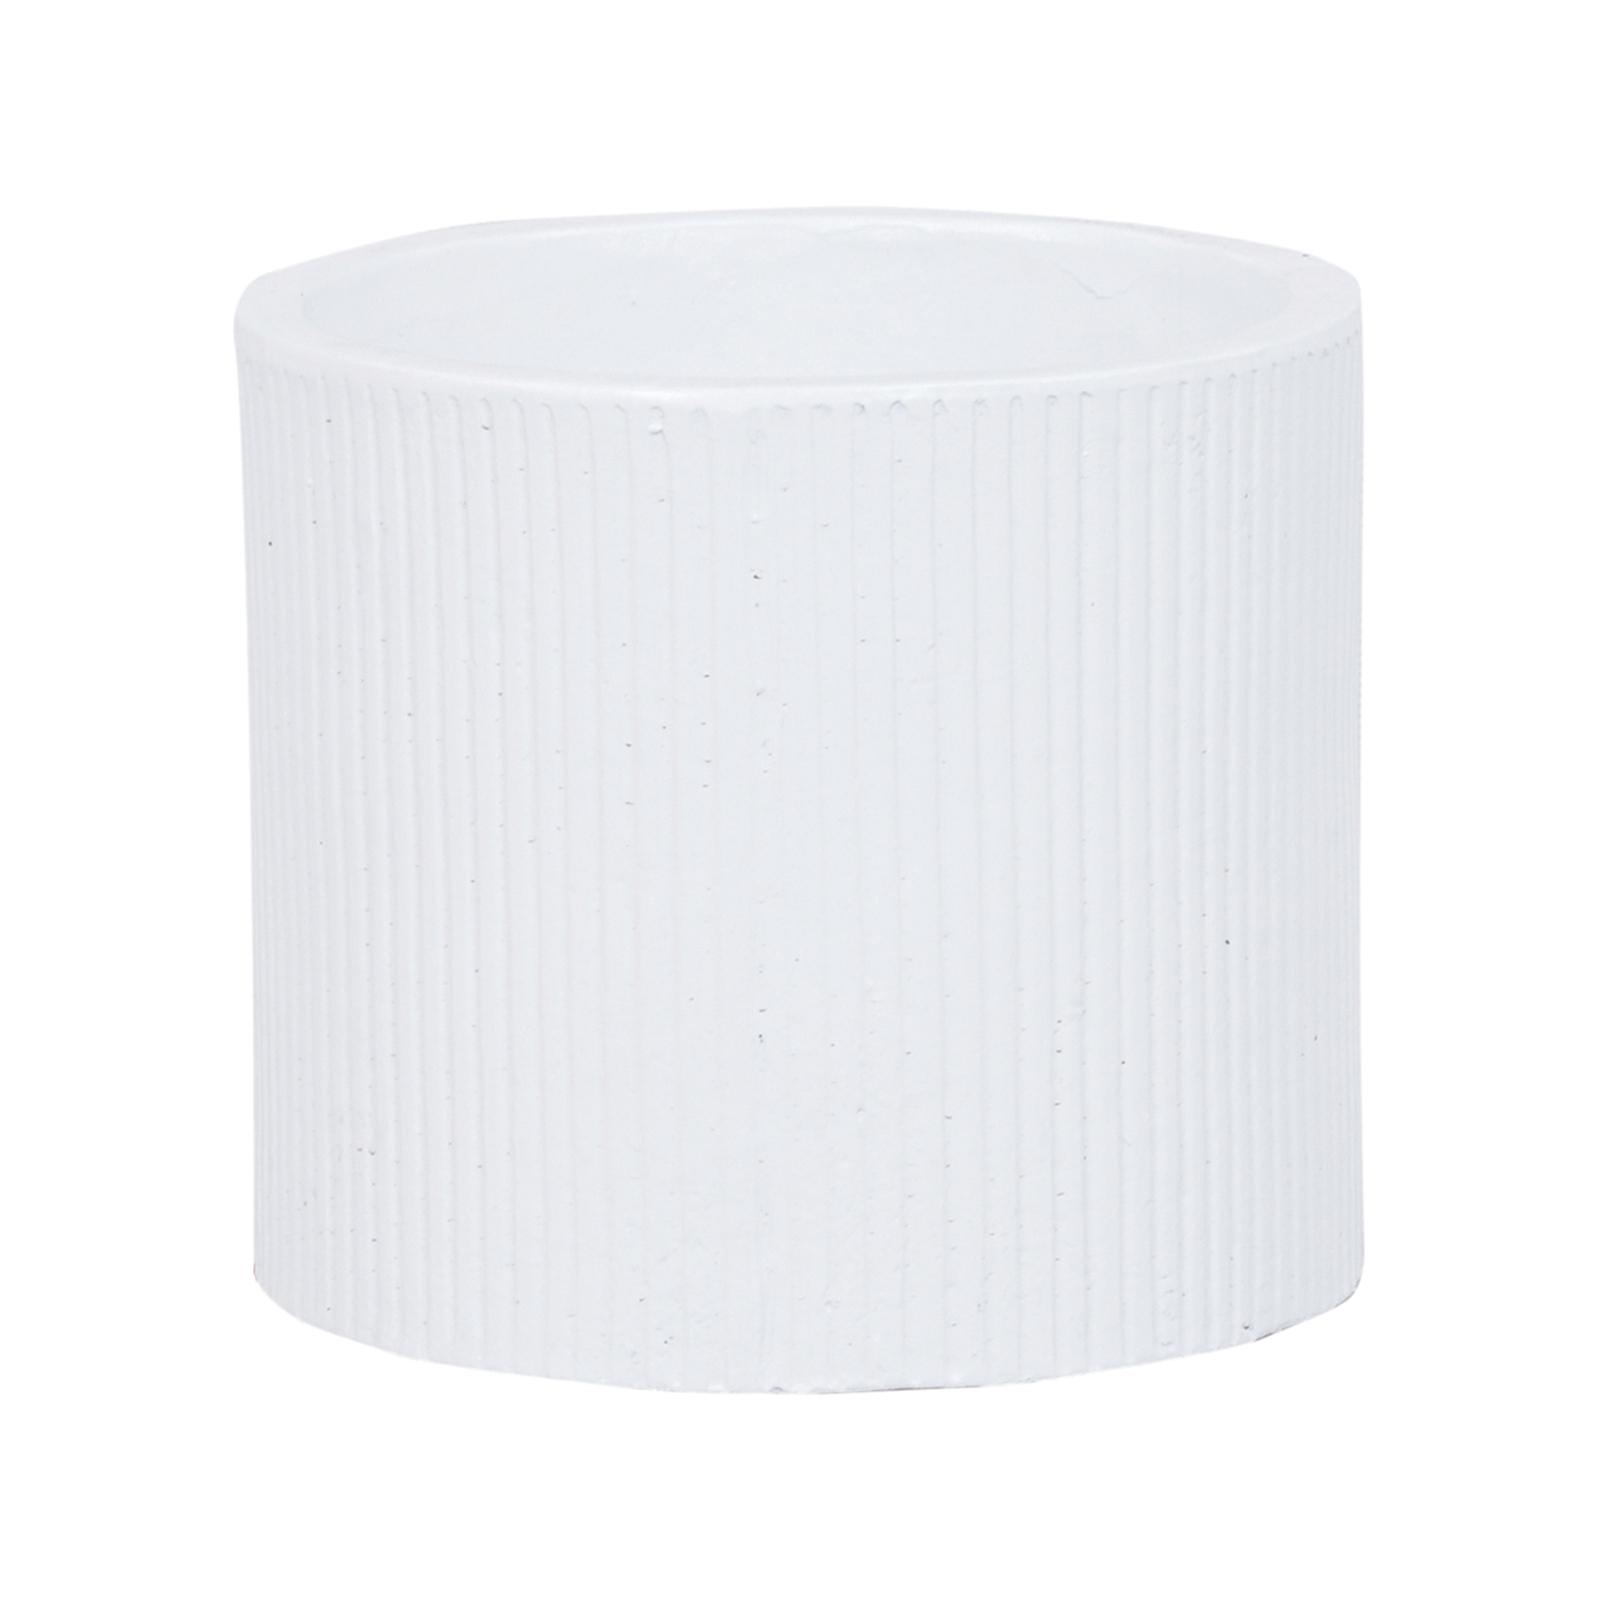 Lotus 18 x 16cm White Medium Cylinder Linear Ceramic Pot